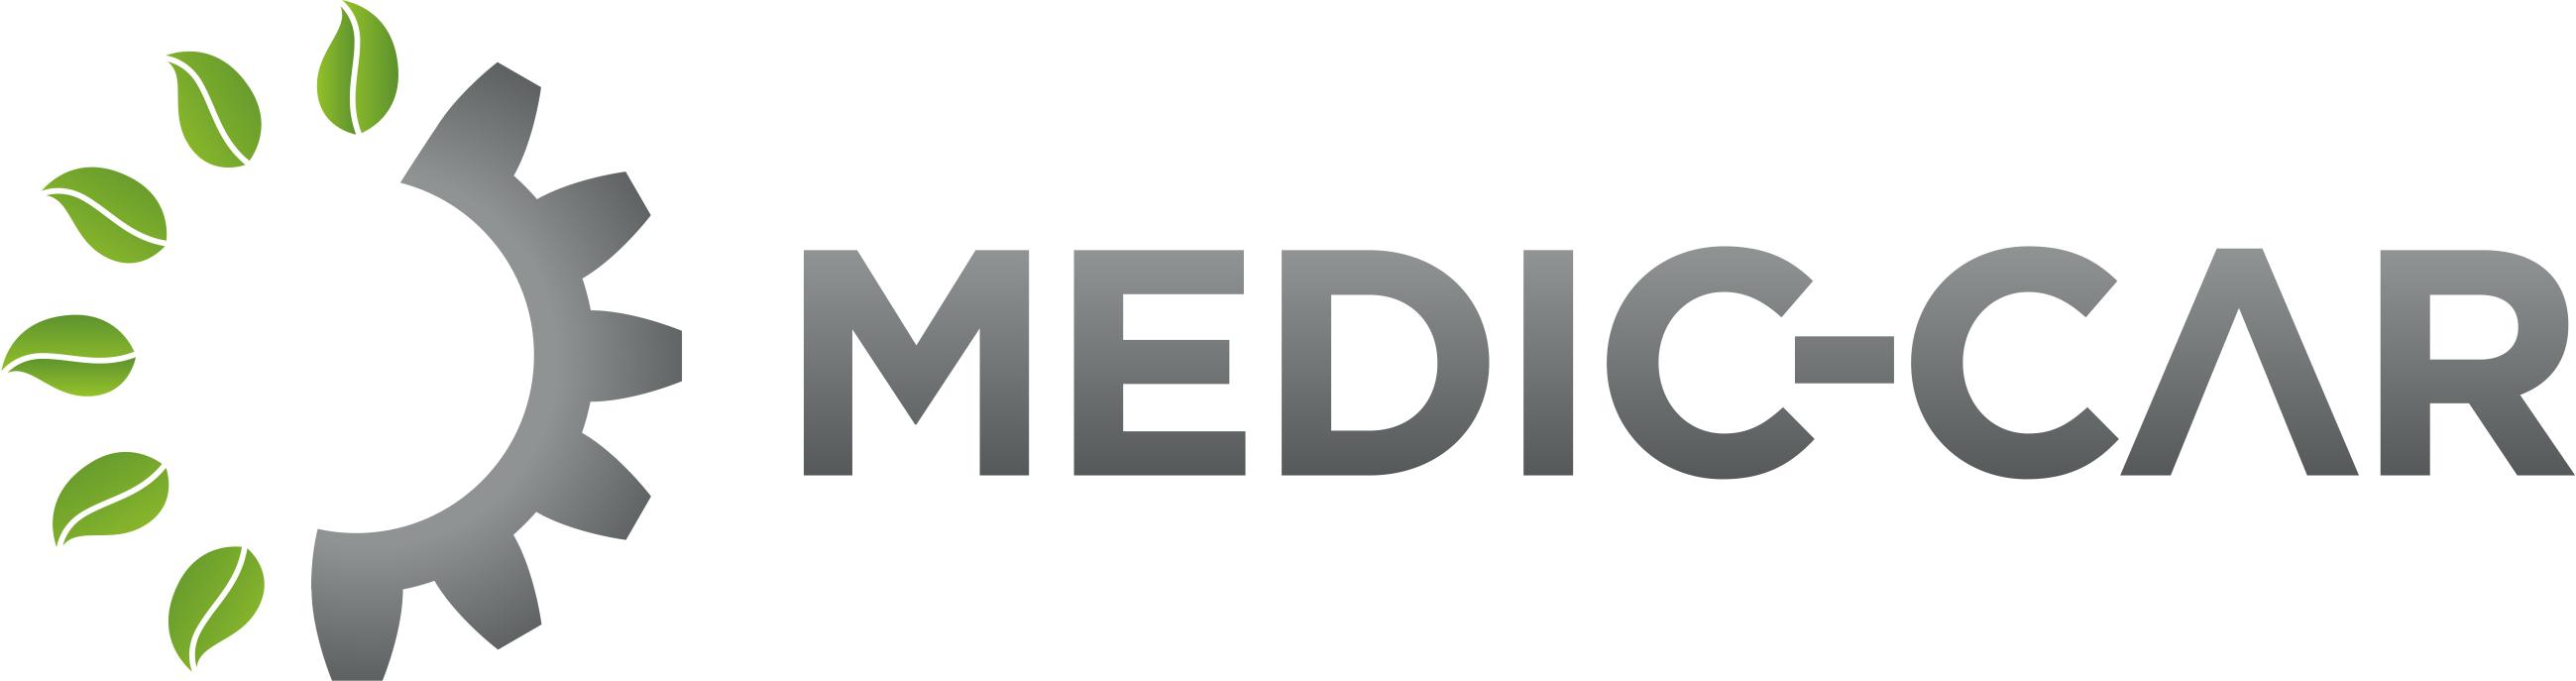 Medic-car Kft.